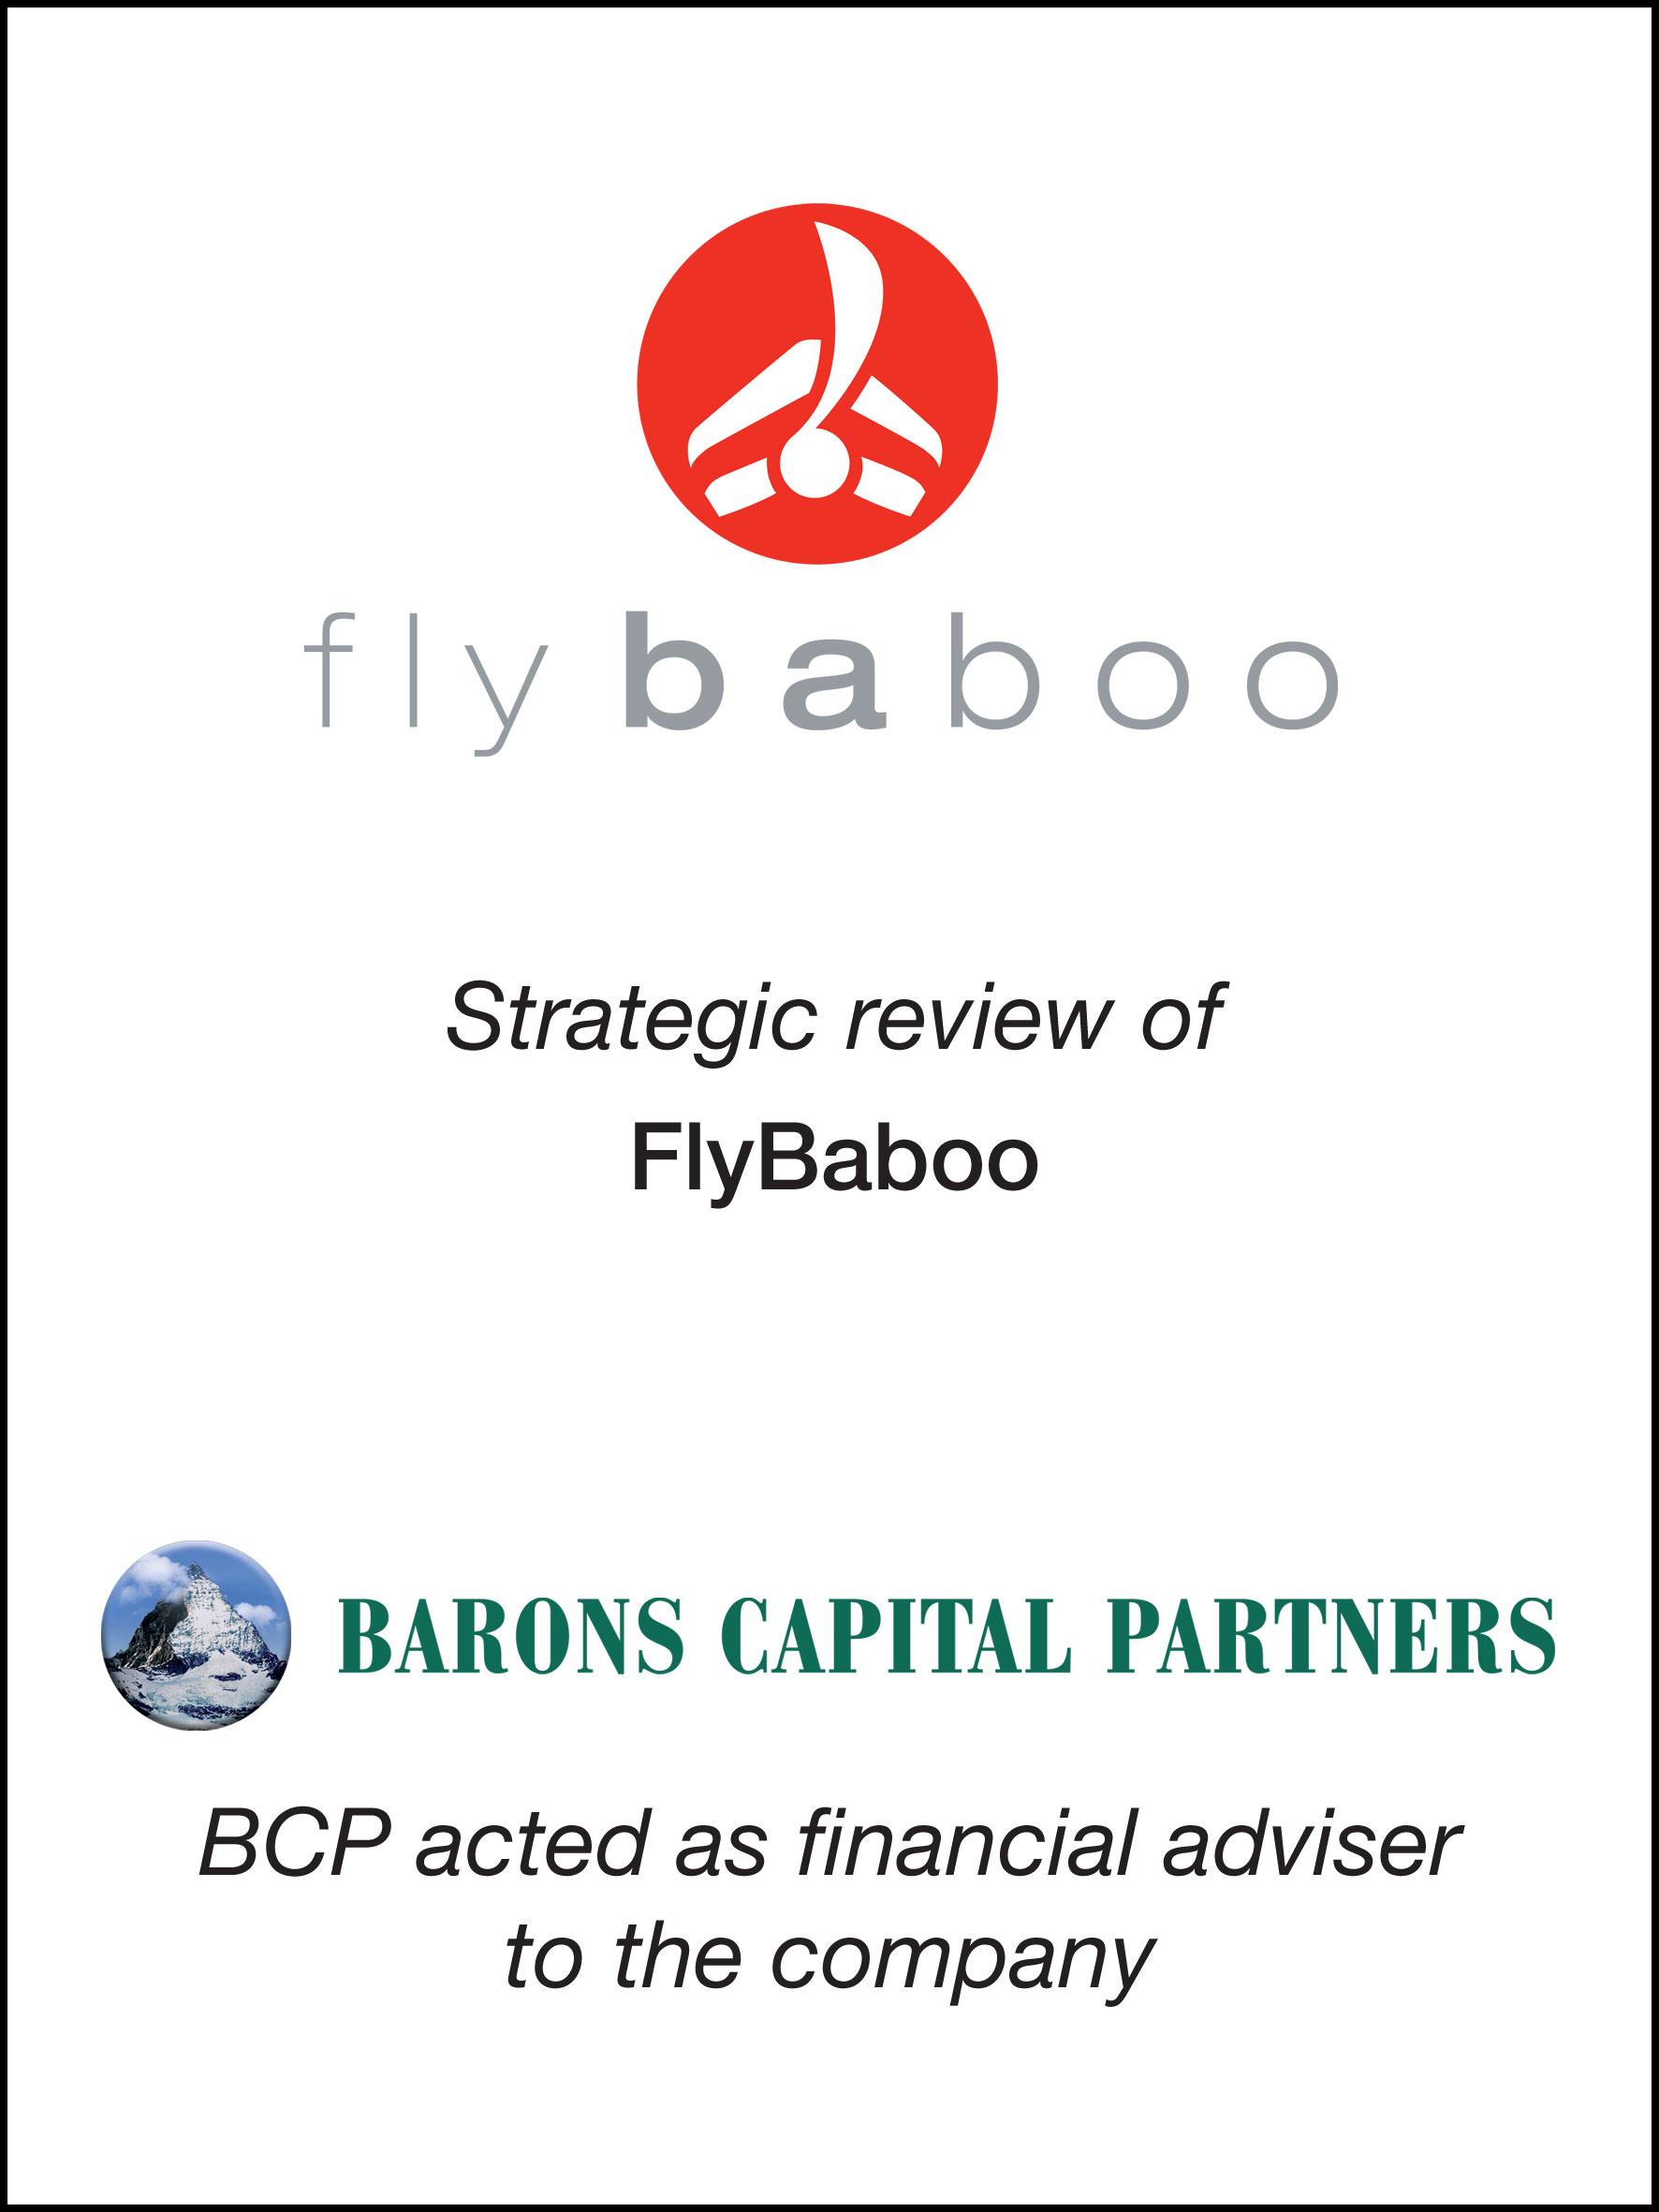 46_FlyBaboo